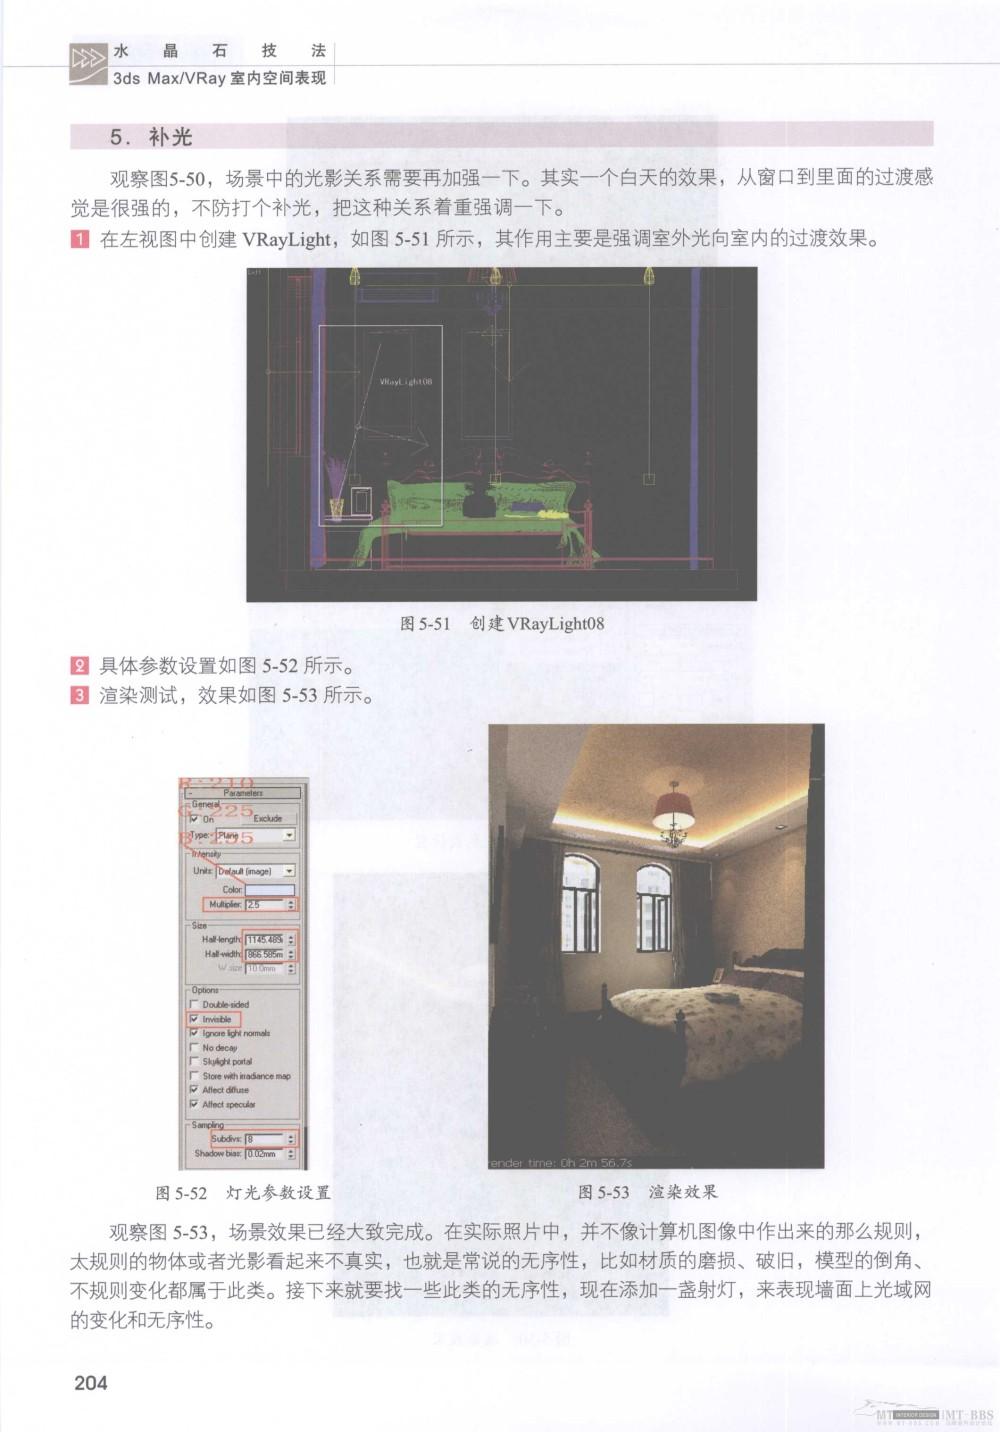 水晶石技法-3ds_Max&VRay室内空间表现_水晶石技法-3ds_Max&VRay室内空间表现_页面_210.jpg